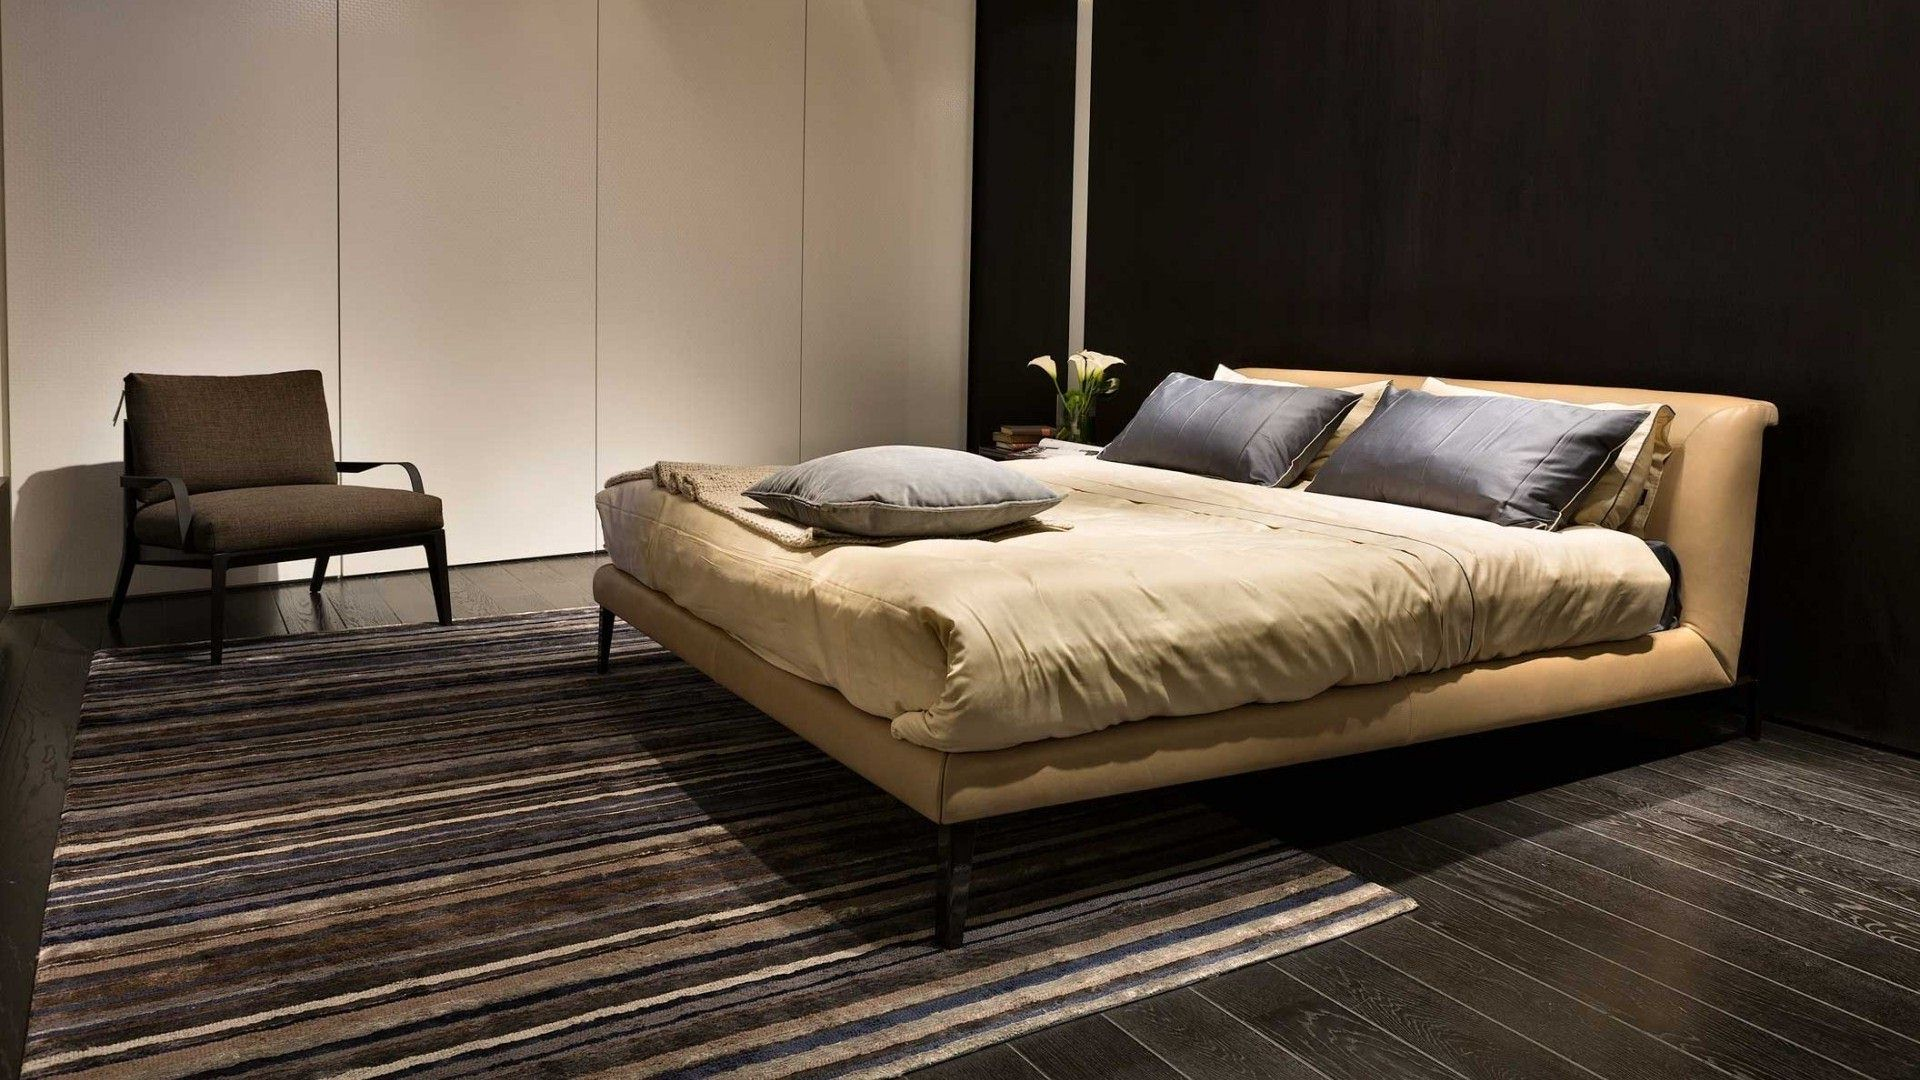 rigoriga-letto-diamante-8540-2-1920x1080